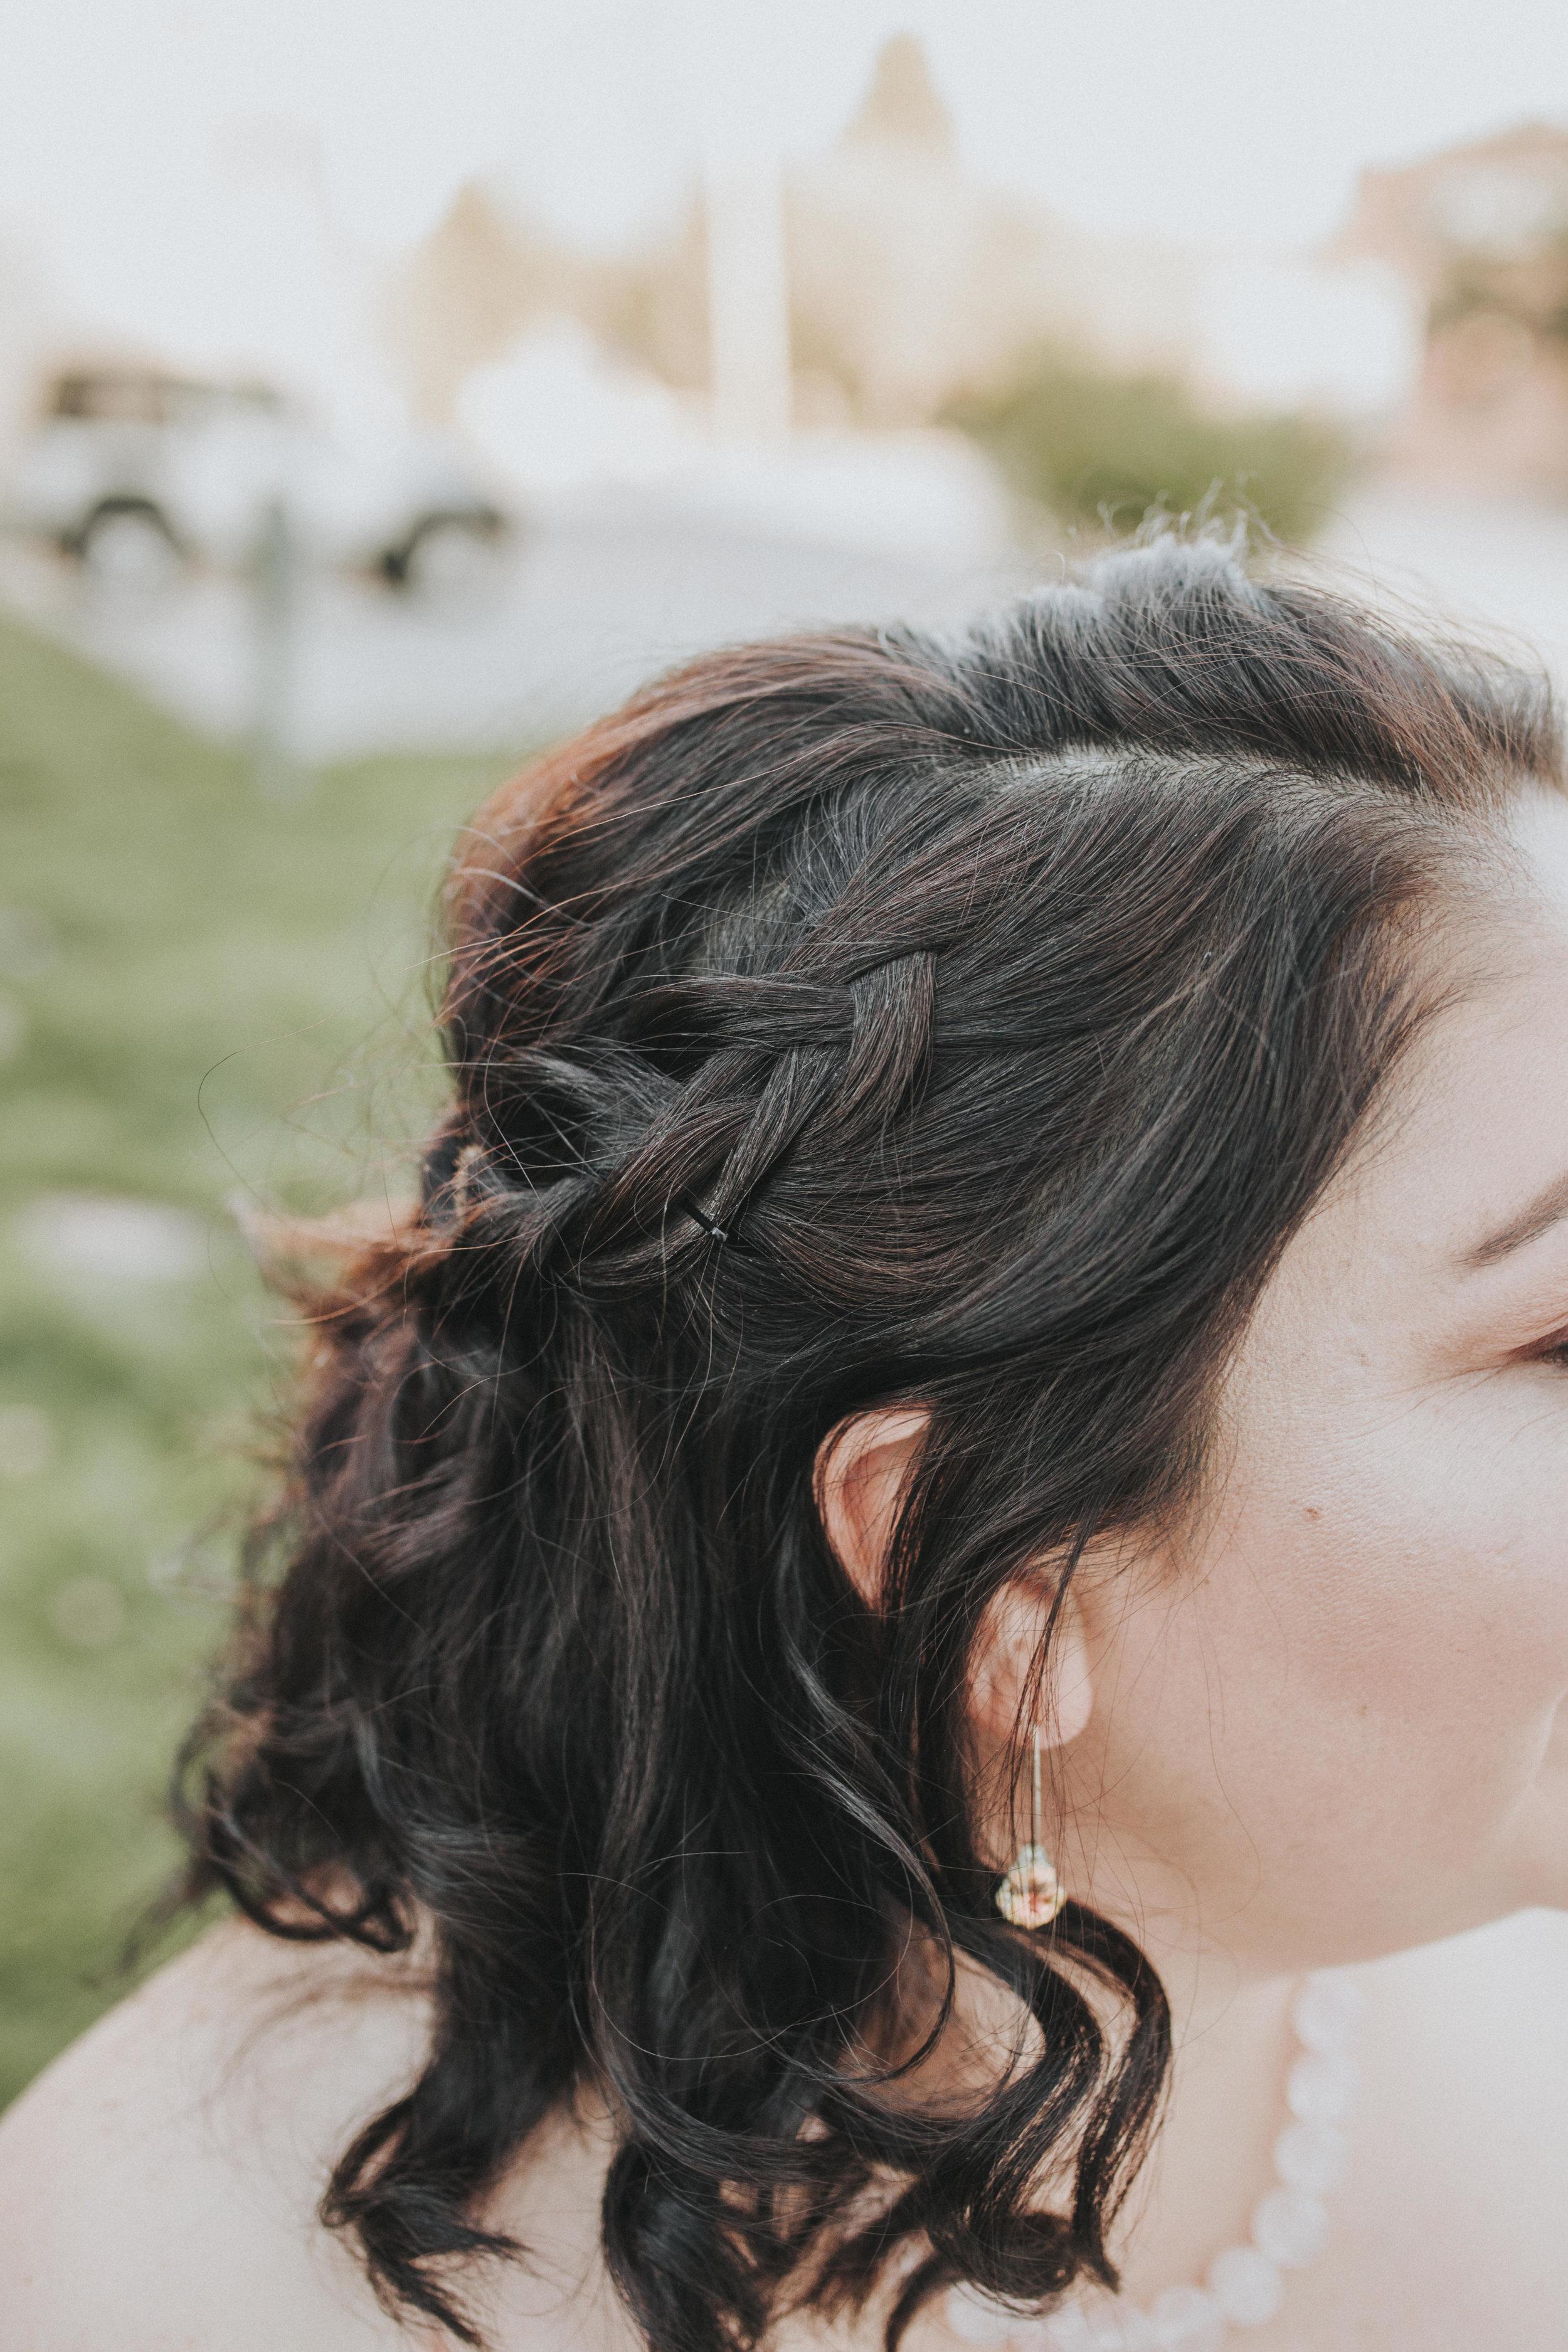 110 midwest-colorado-nebraska-elopement-photography-gretna-turtledoves.jpg